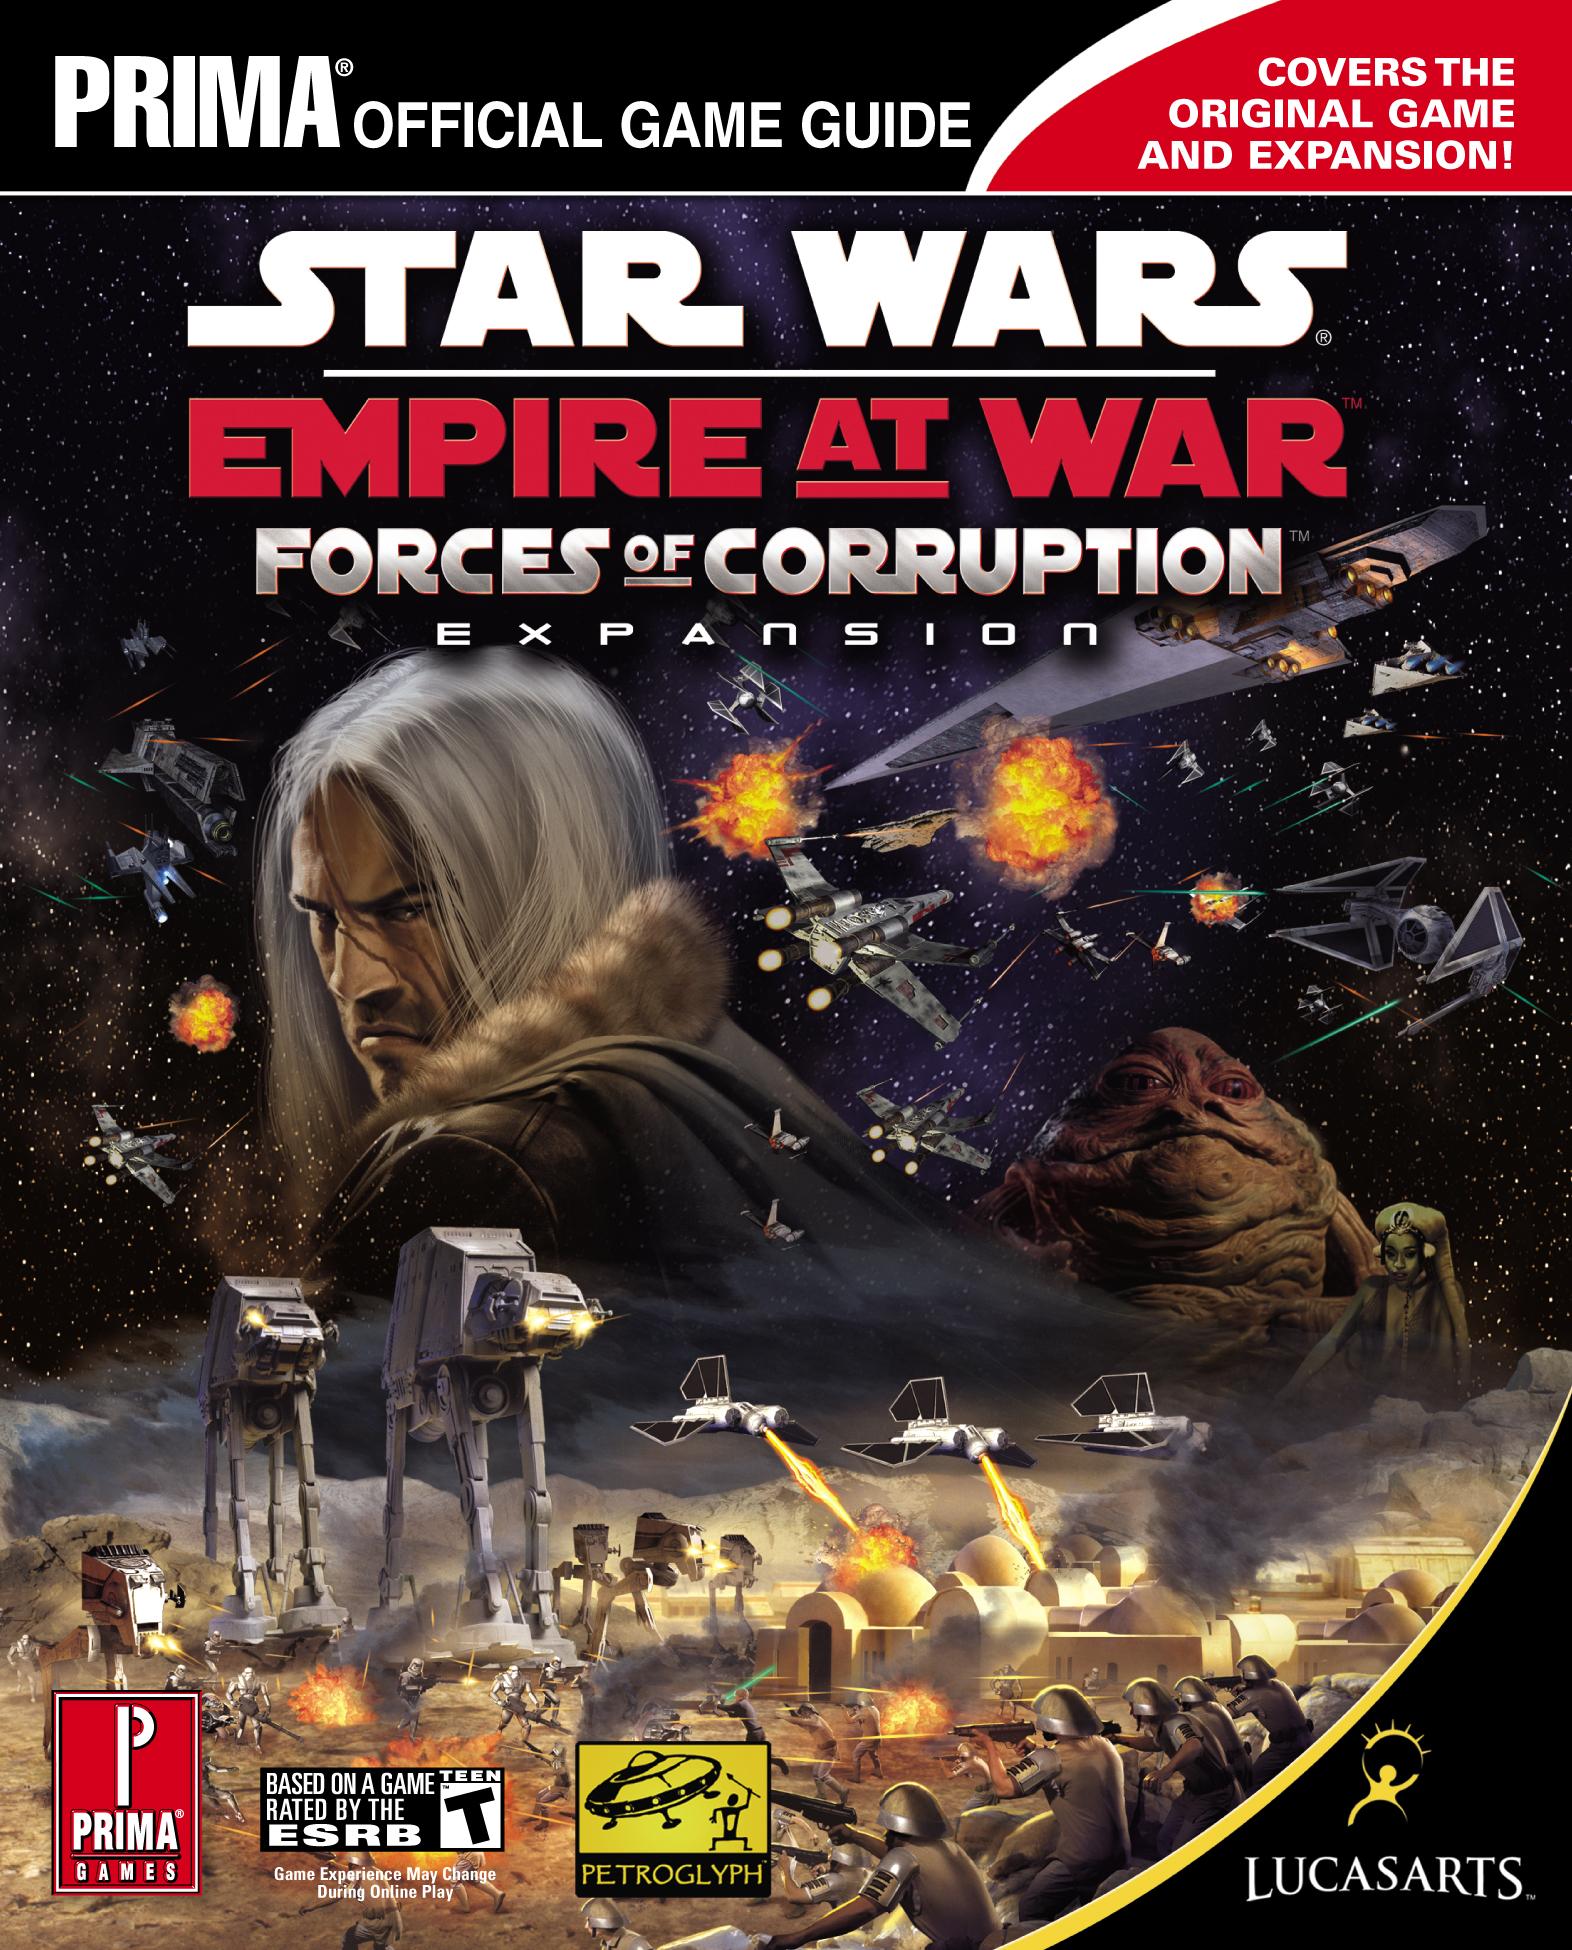 Star Wars: Empire at War: Forces of Corruption: Официальное игровое руководство Prima